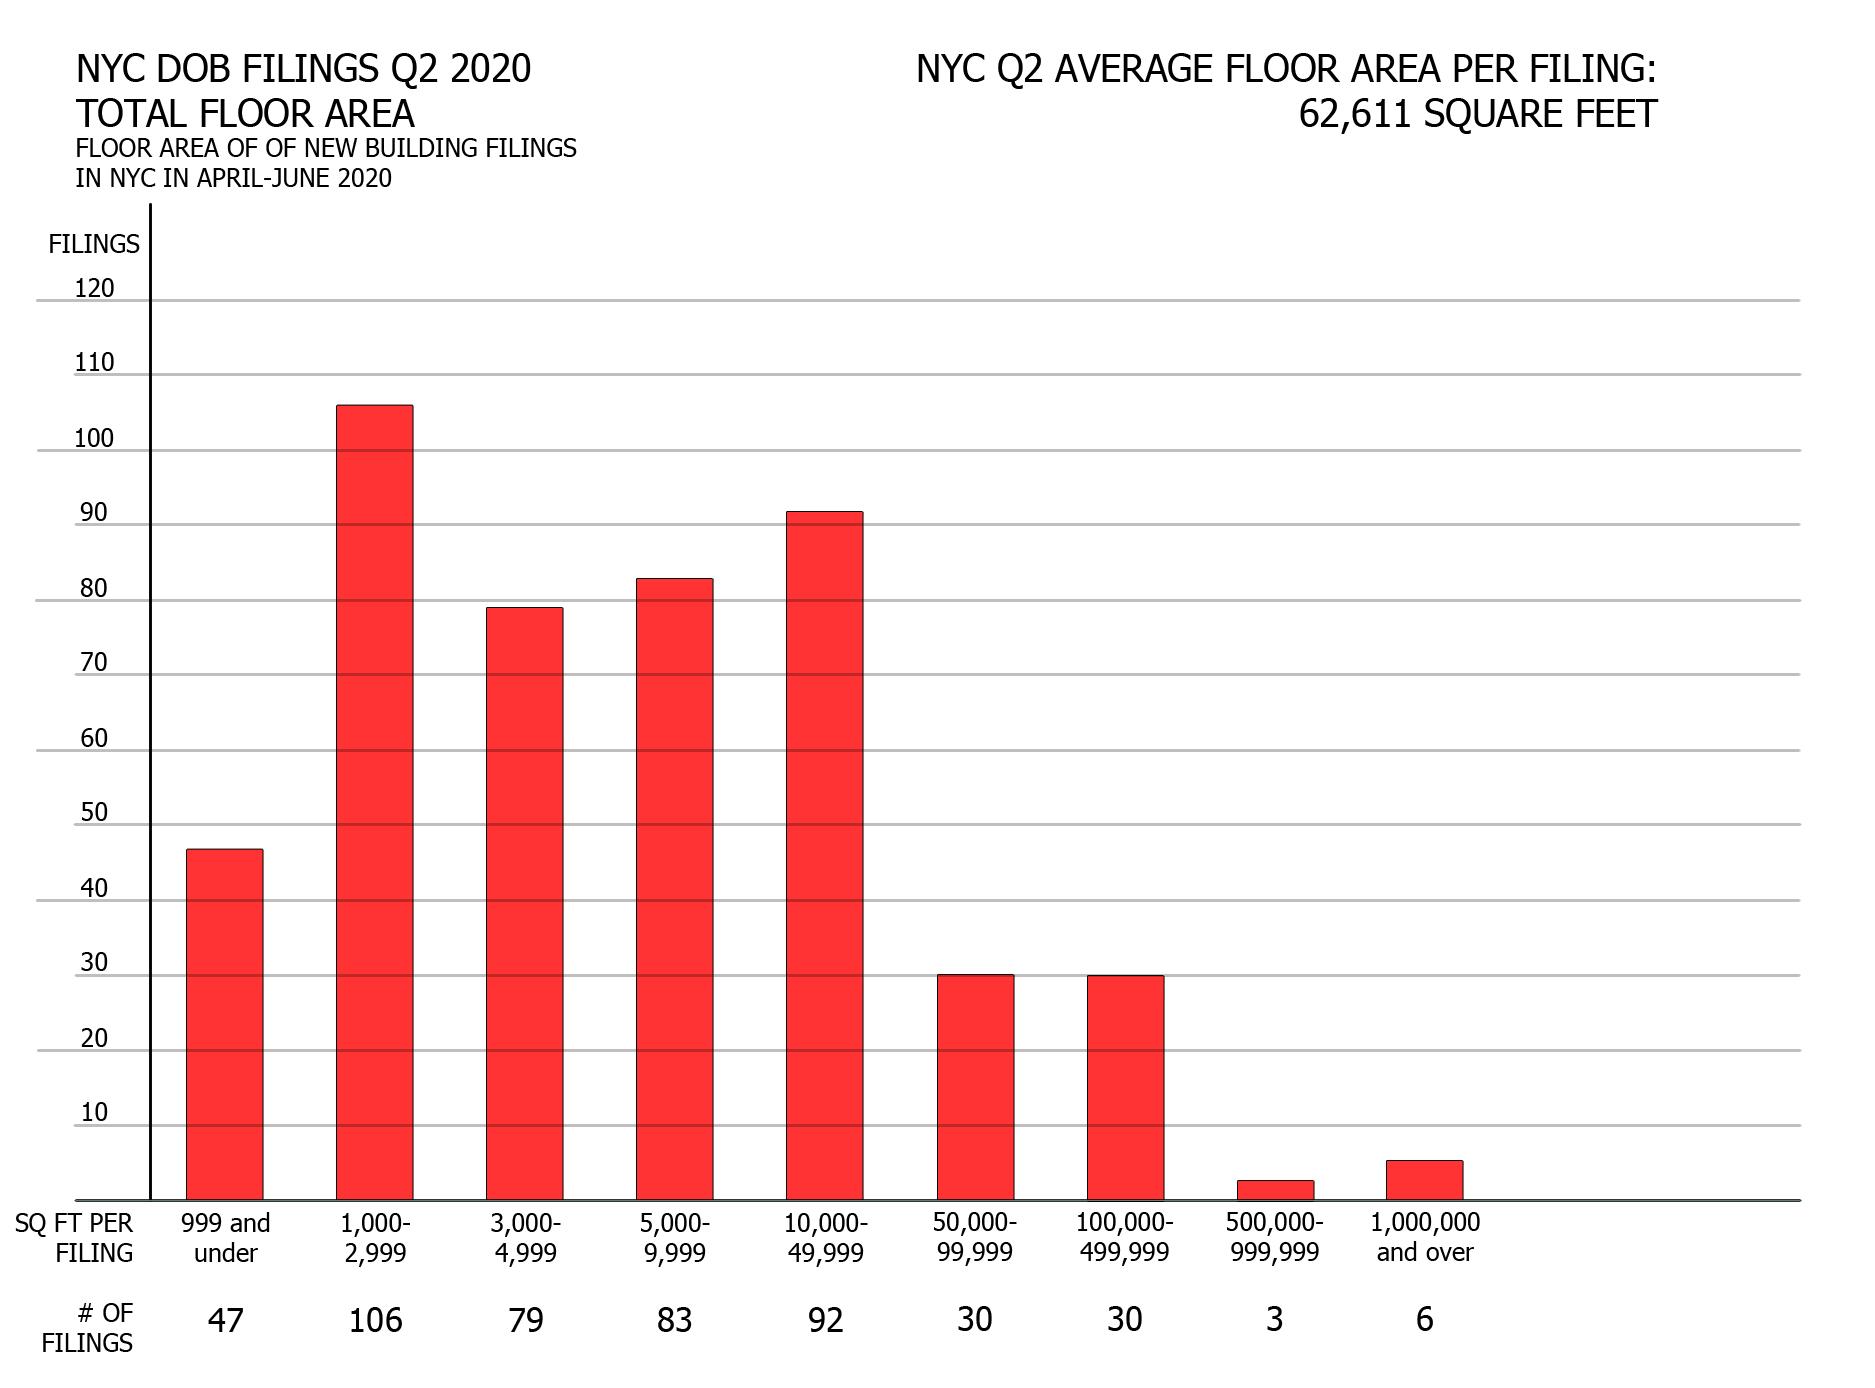 NYC Q2 2020 filings - Filings grouped by floor area. Image credit: Vitali Ogorodnikov